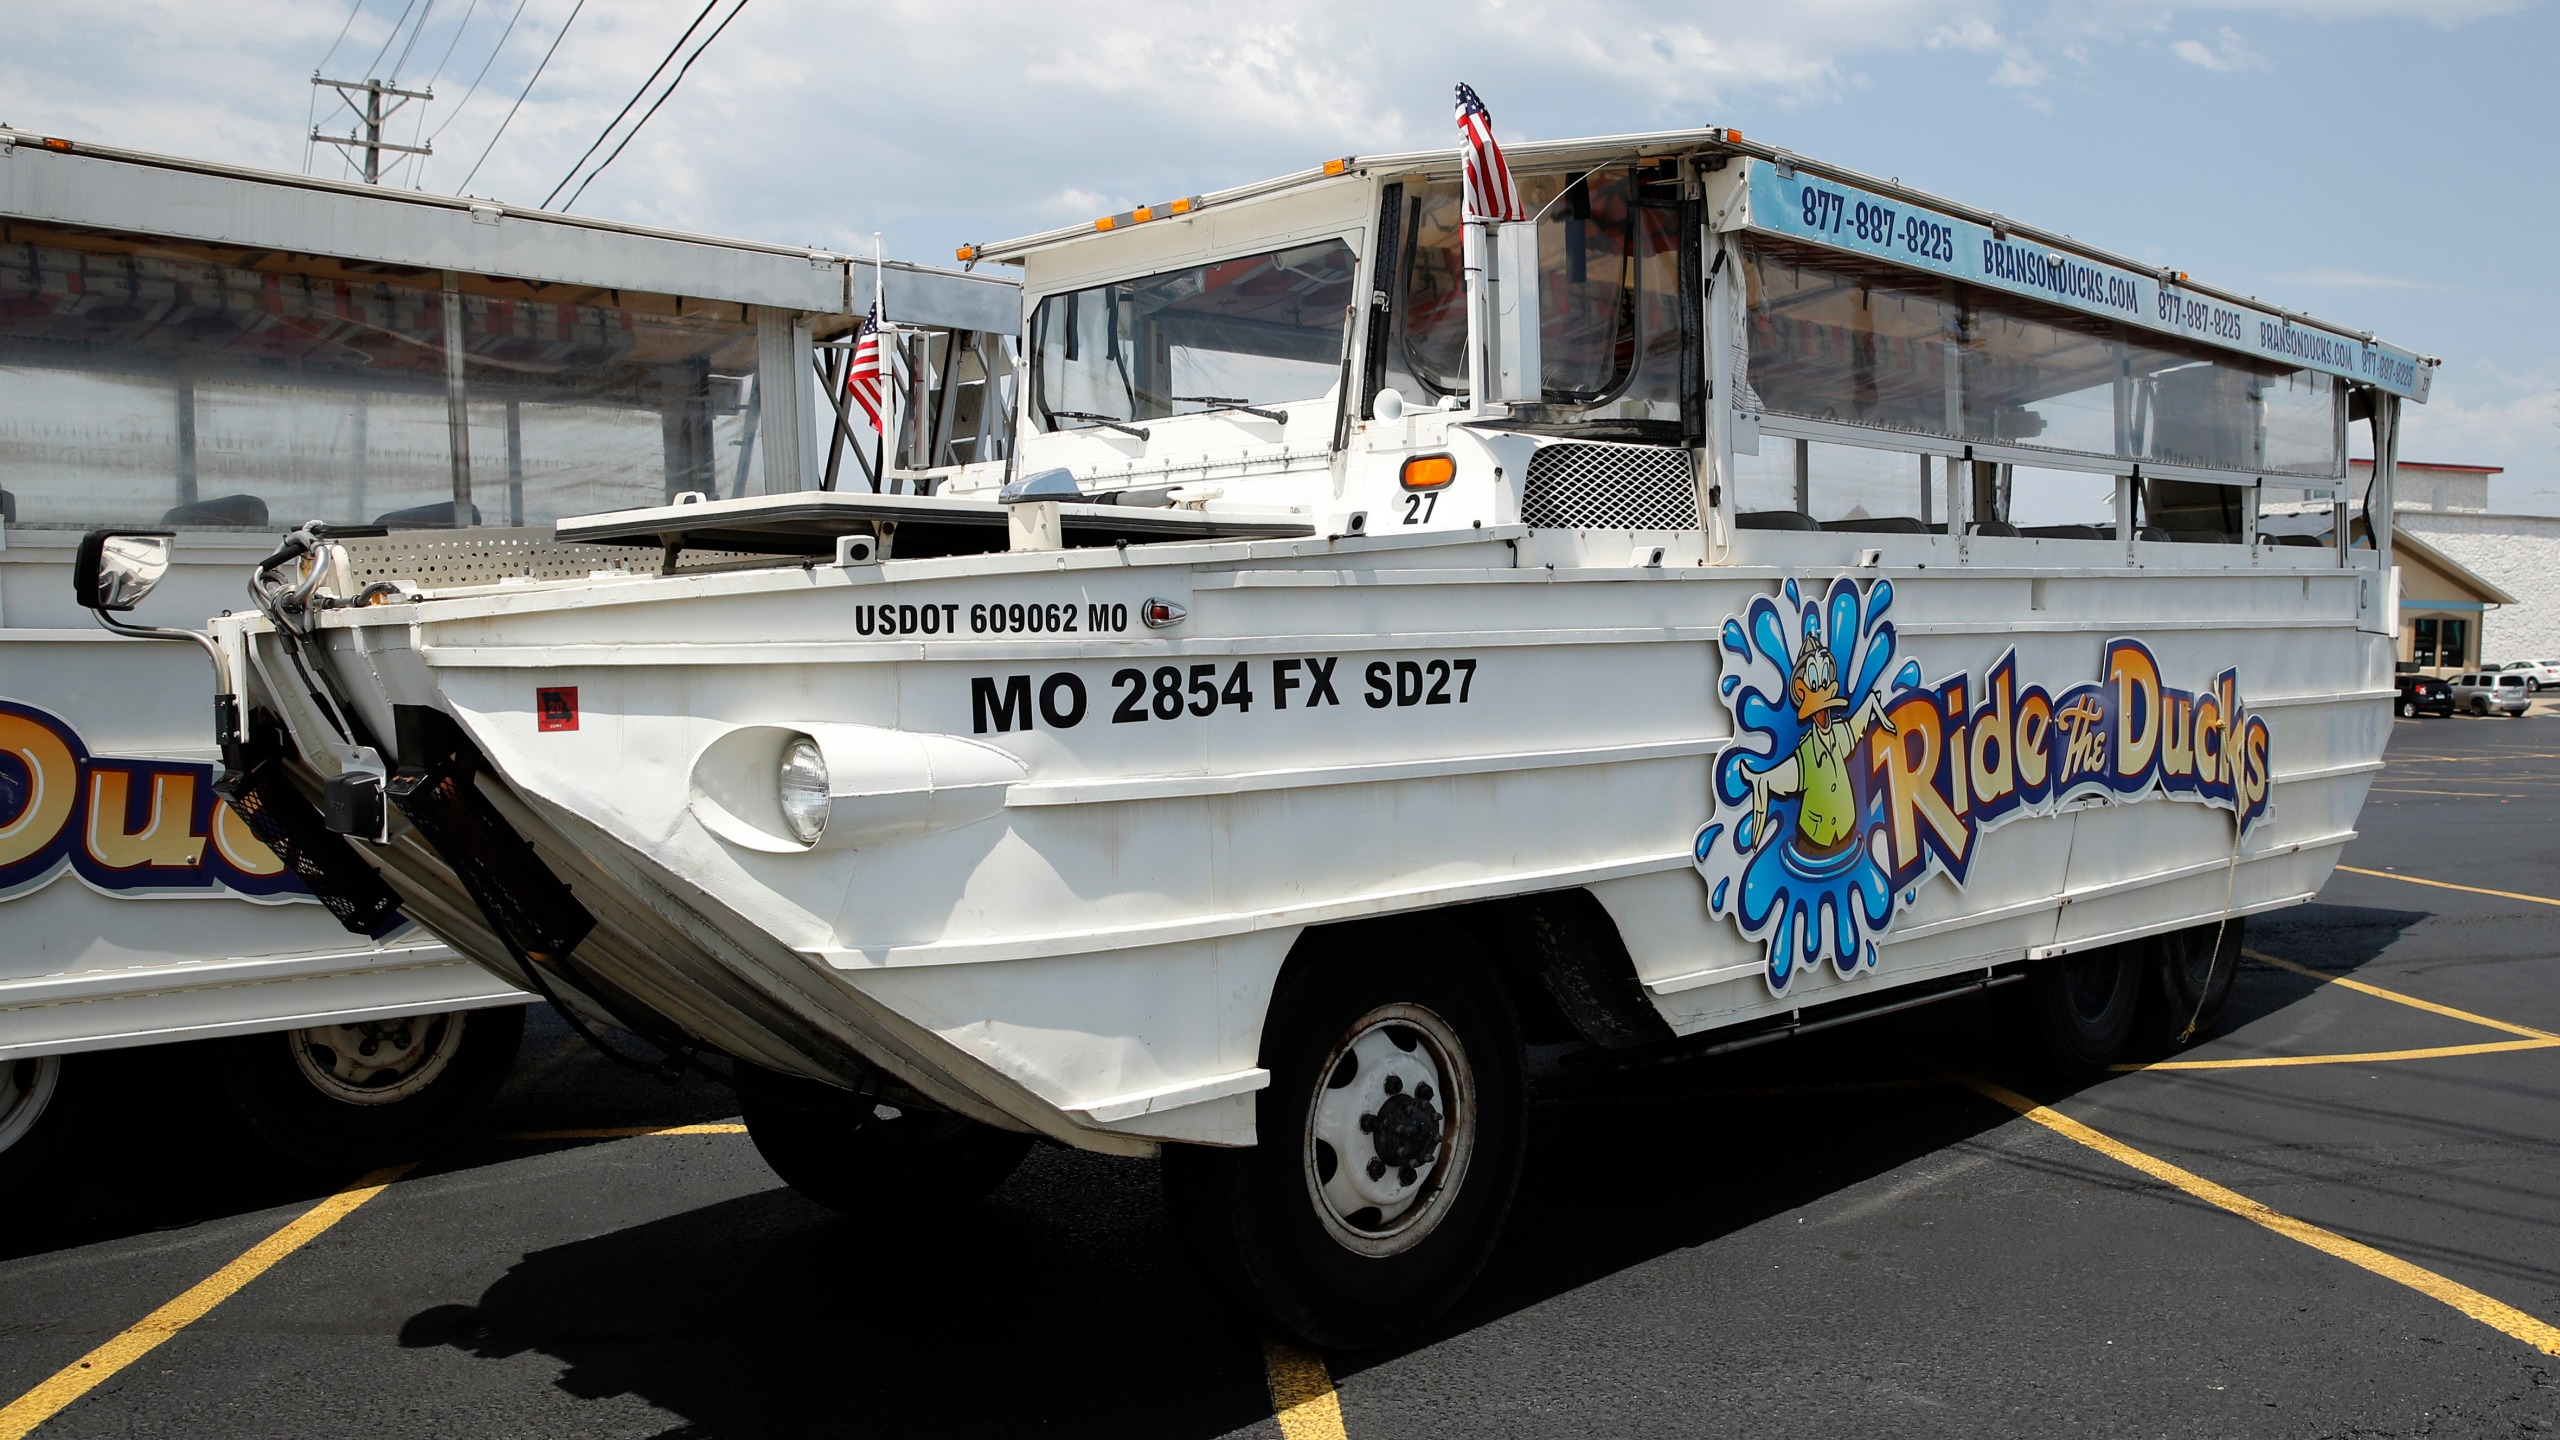 Missouri_Boat_Accident_Duck_Boats_43143-159532.jpg13785884